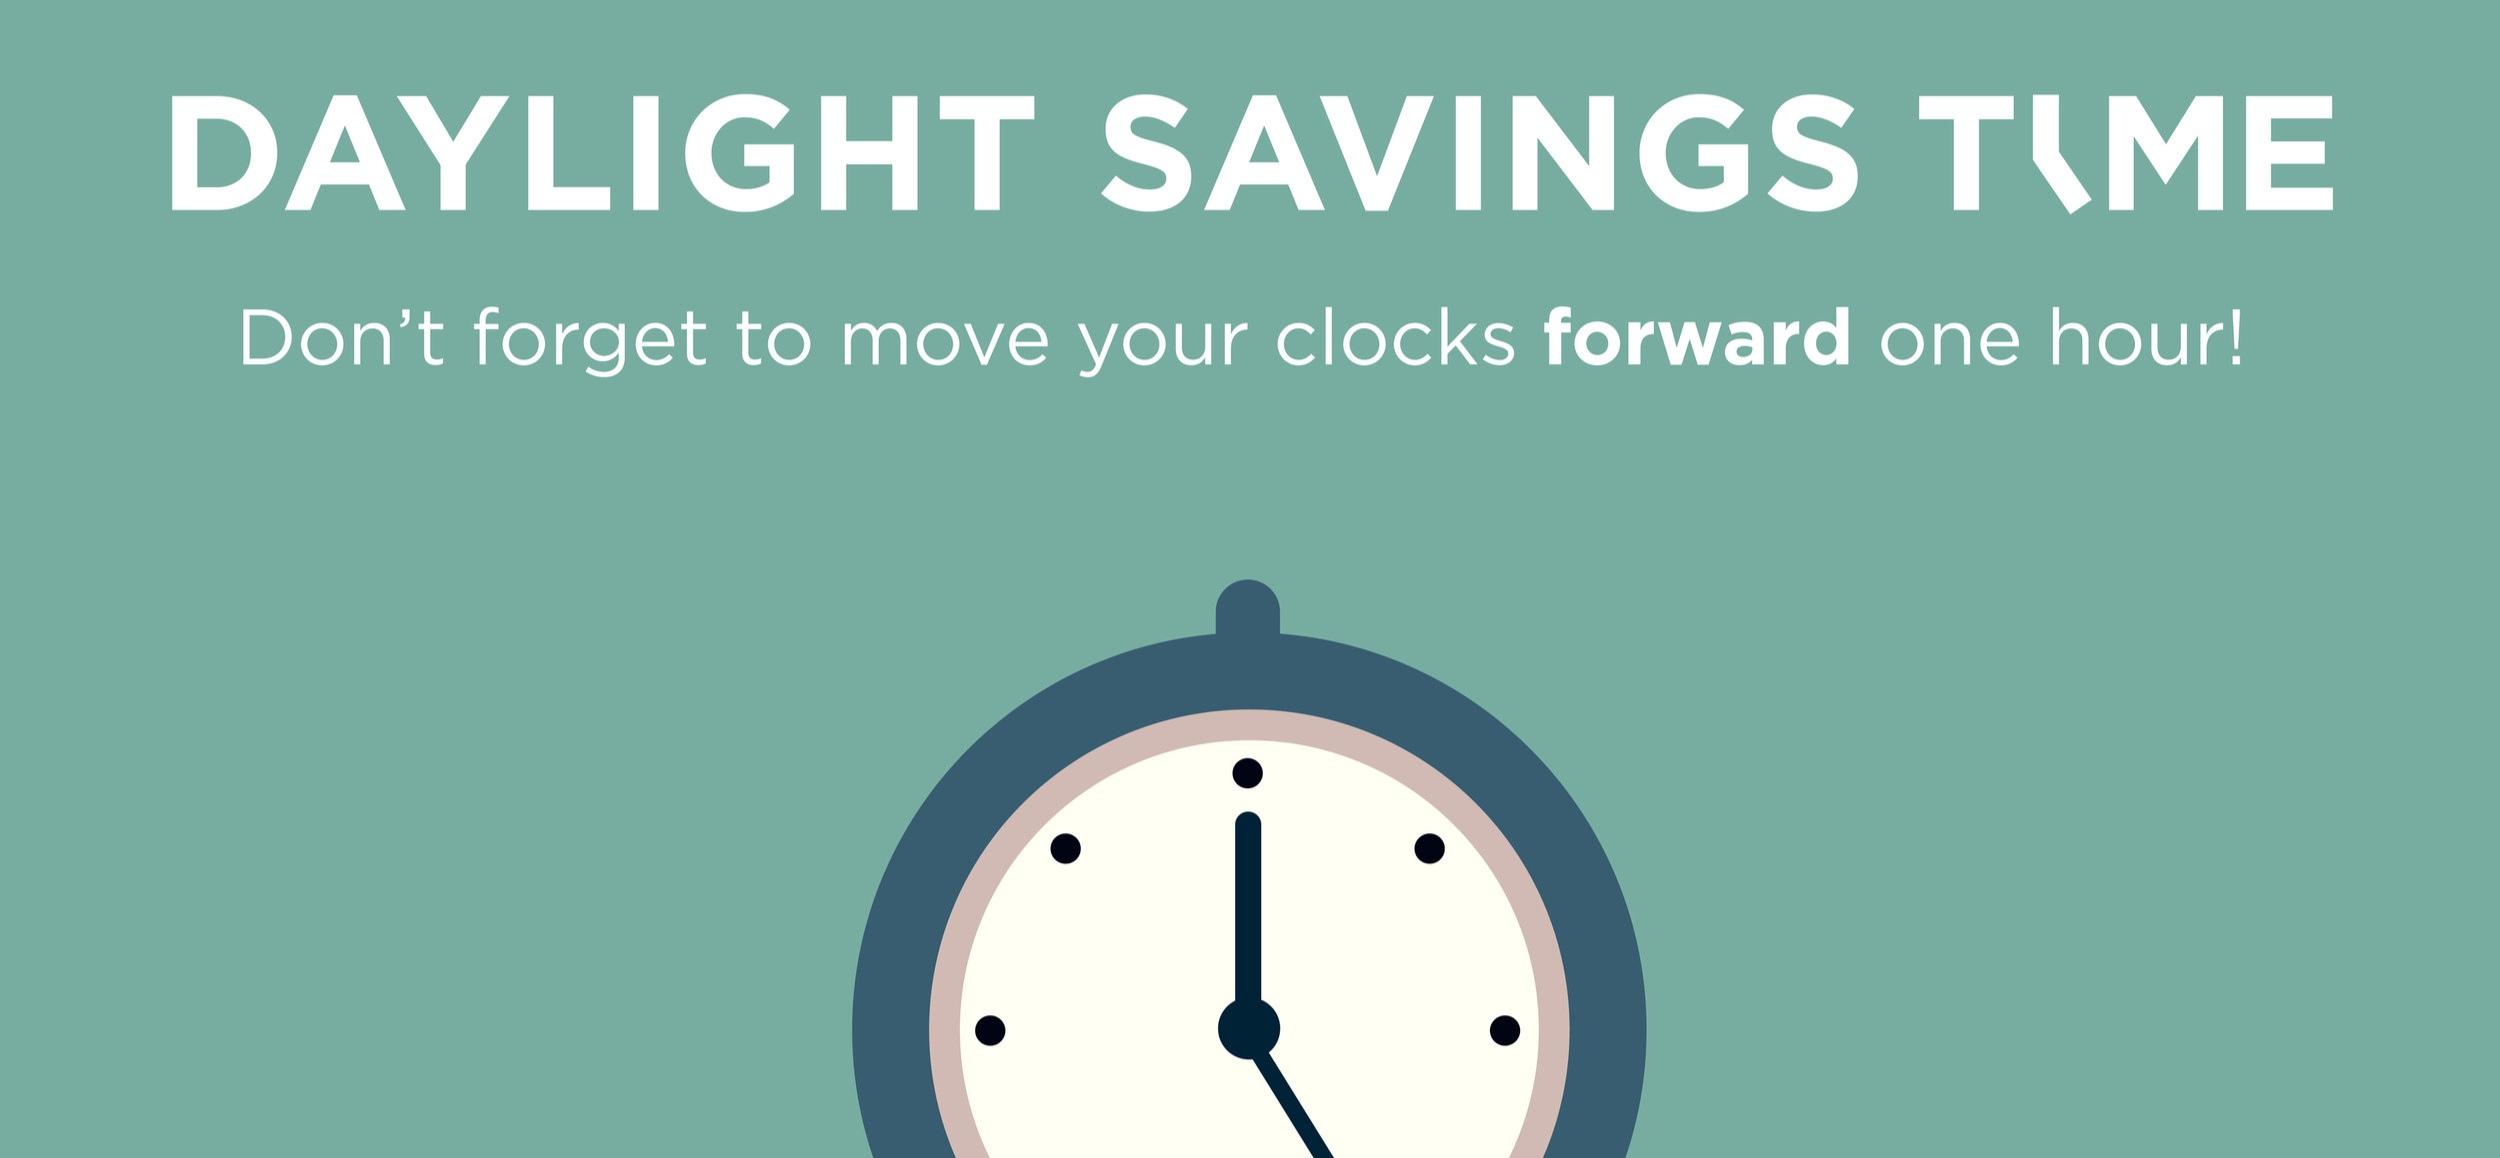 0e7024831_1519322314_daylight-savings-002.jpg